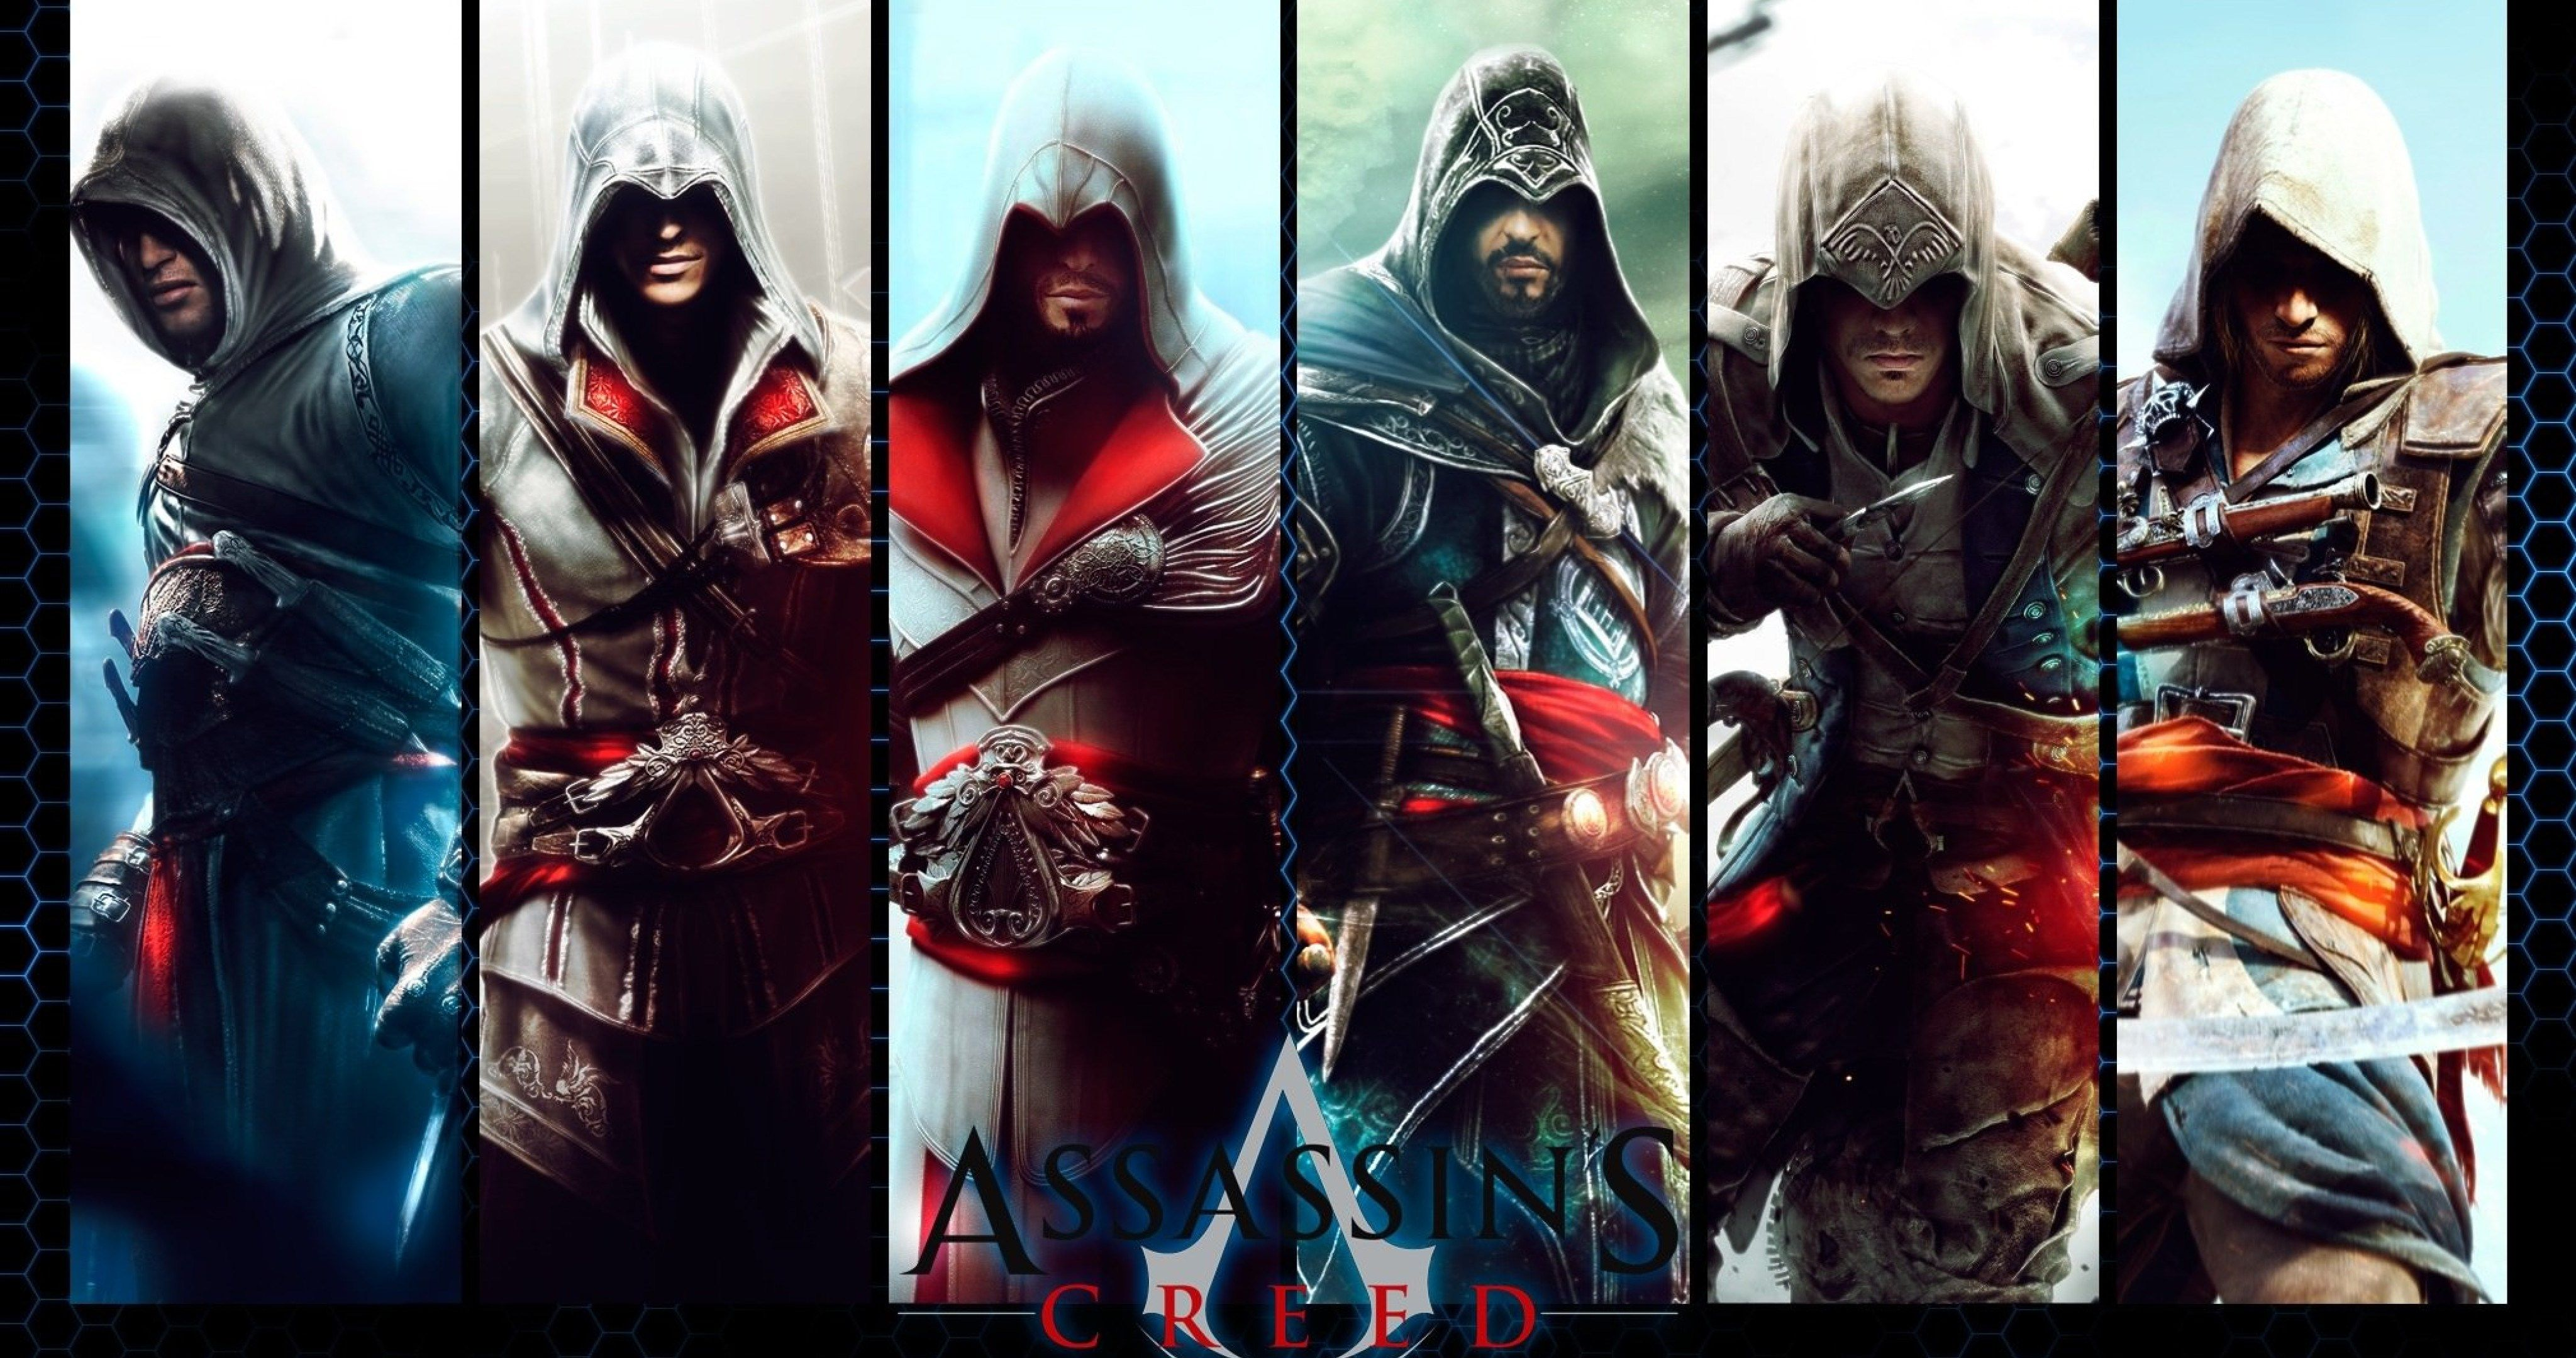 assassins creed game characters 4k ultra hd wallpaper